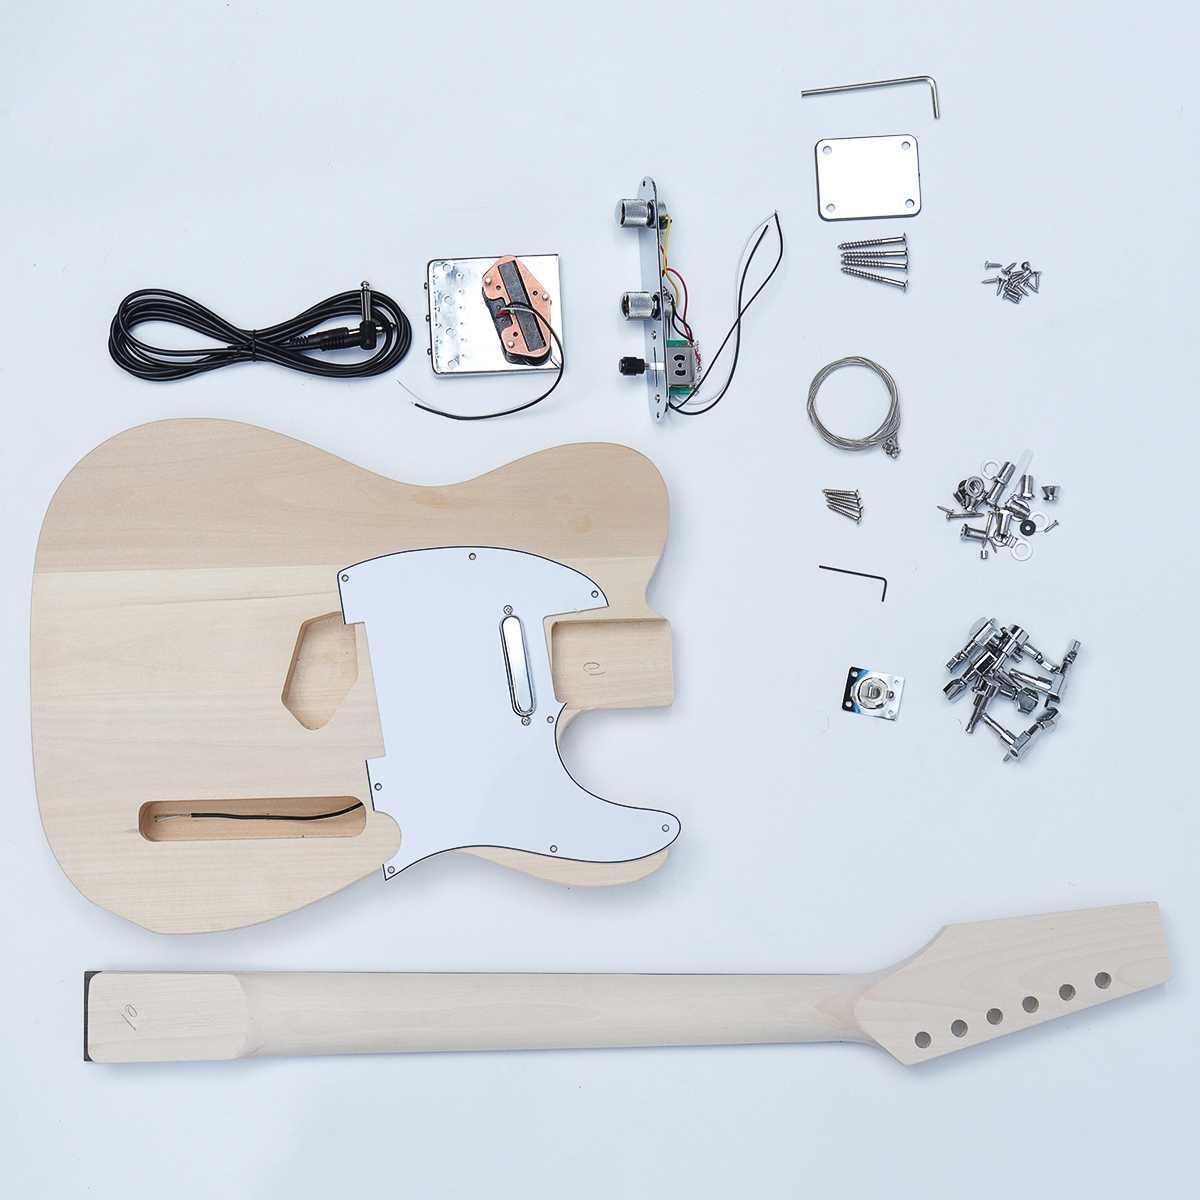 beech wood diy electric guitar accessories kit body maple neck 6 stringed instrument guitar. Black Bedroom Furniture Sets. Home Design Ideas